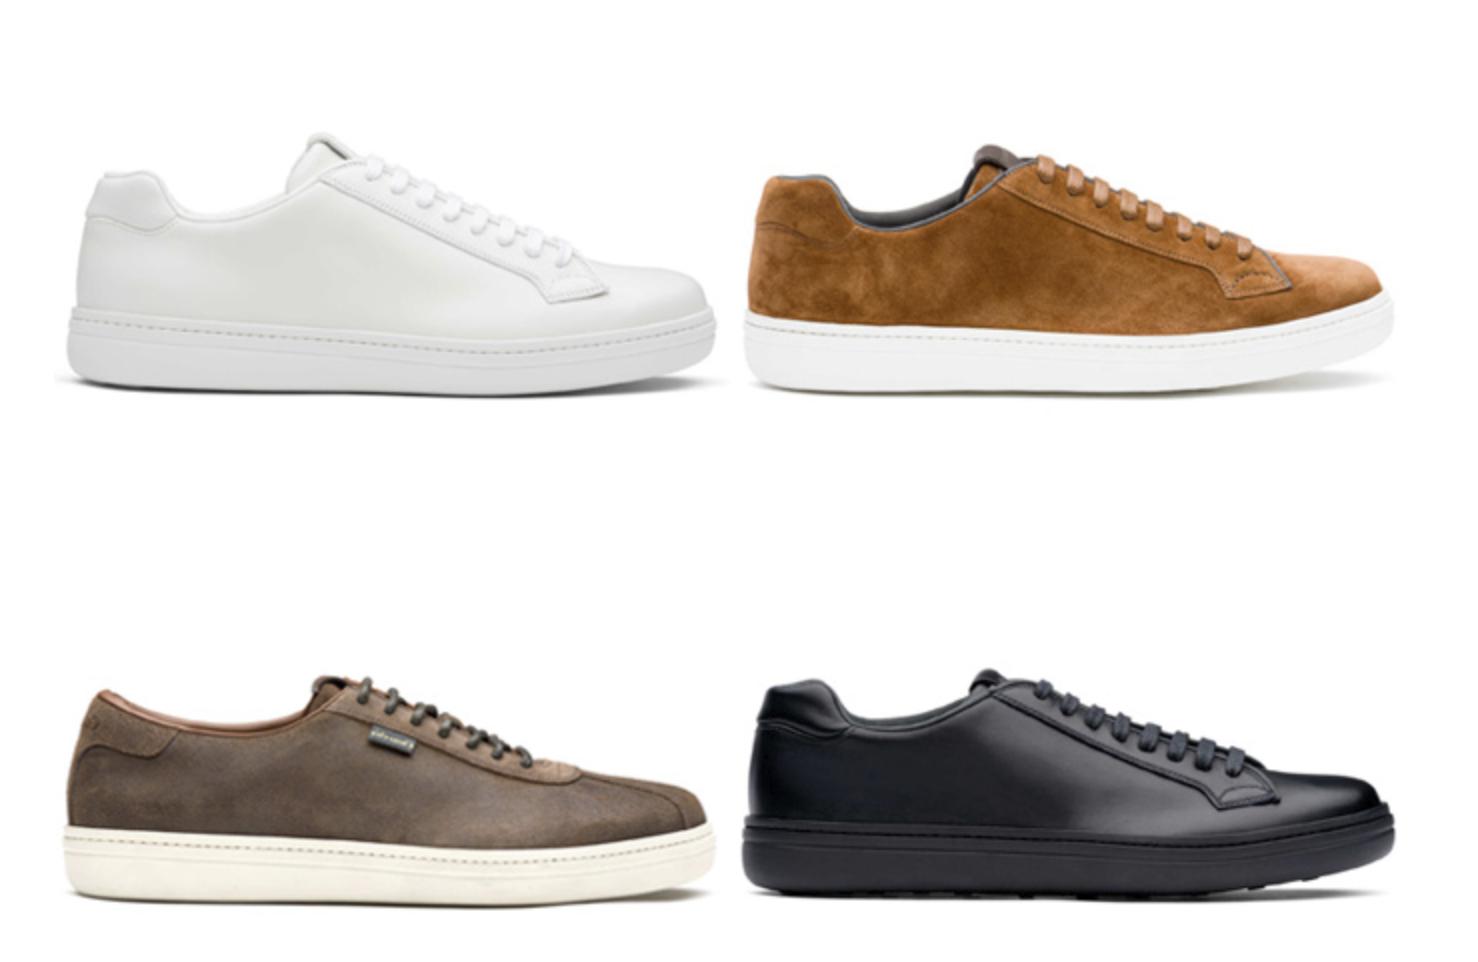 luxury sneakers - 14 Luxury Sneakers Terbaik dari Desainer Dunia